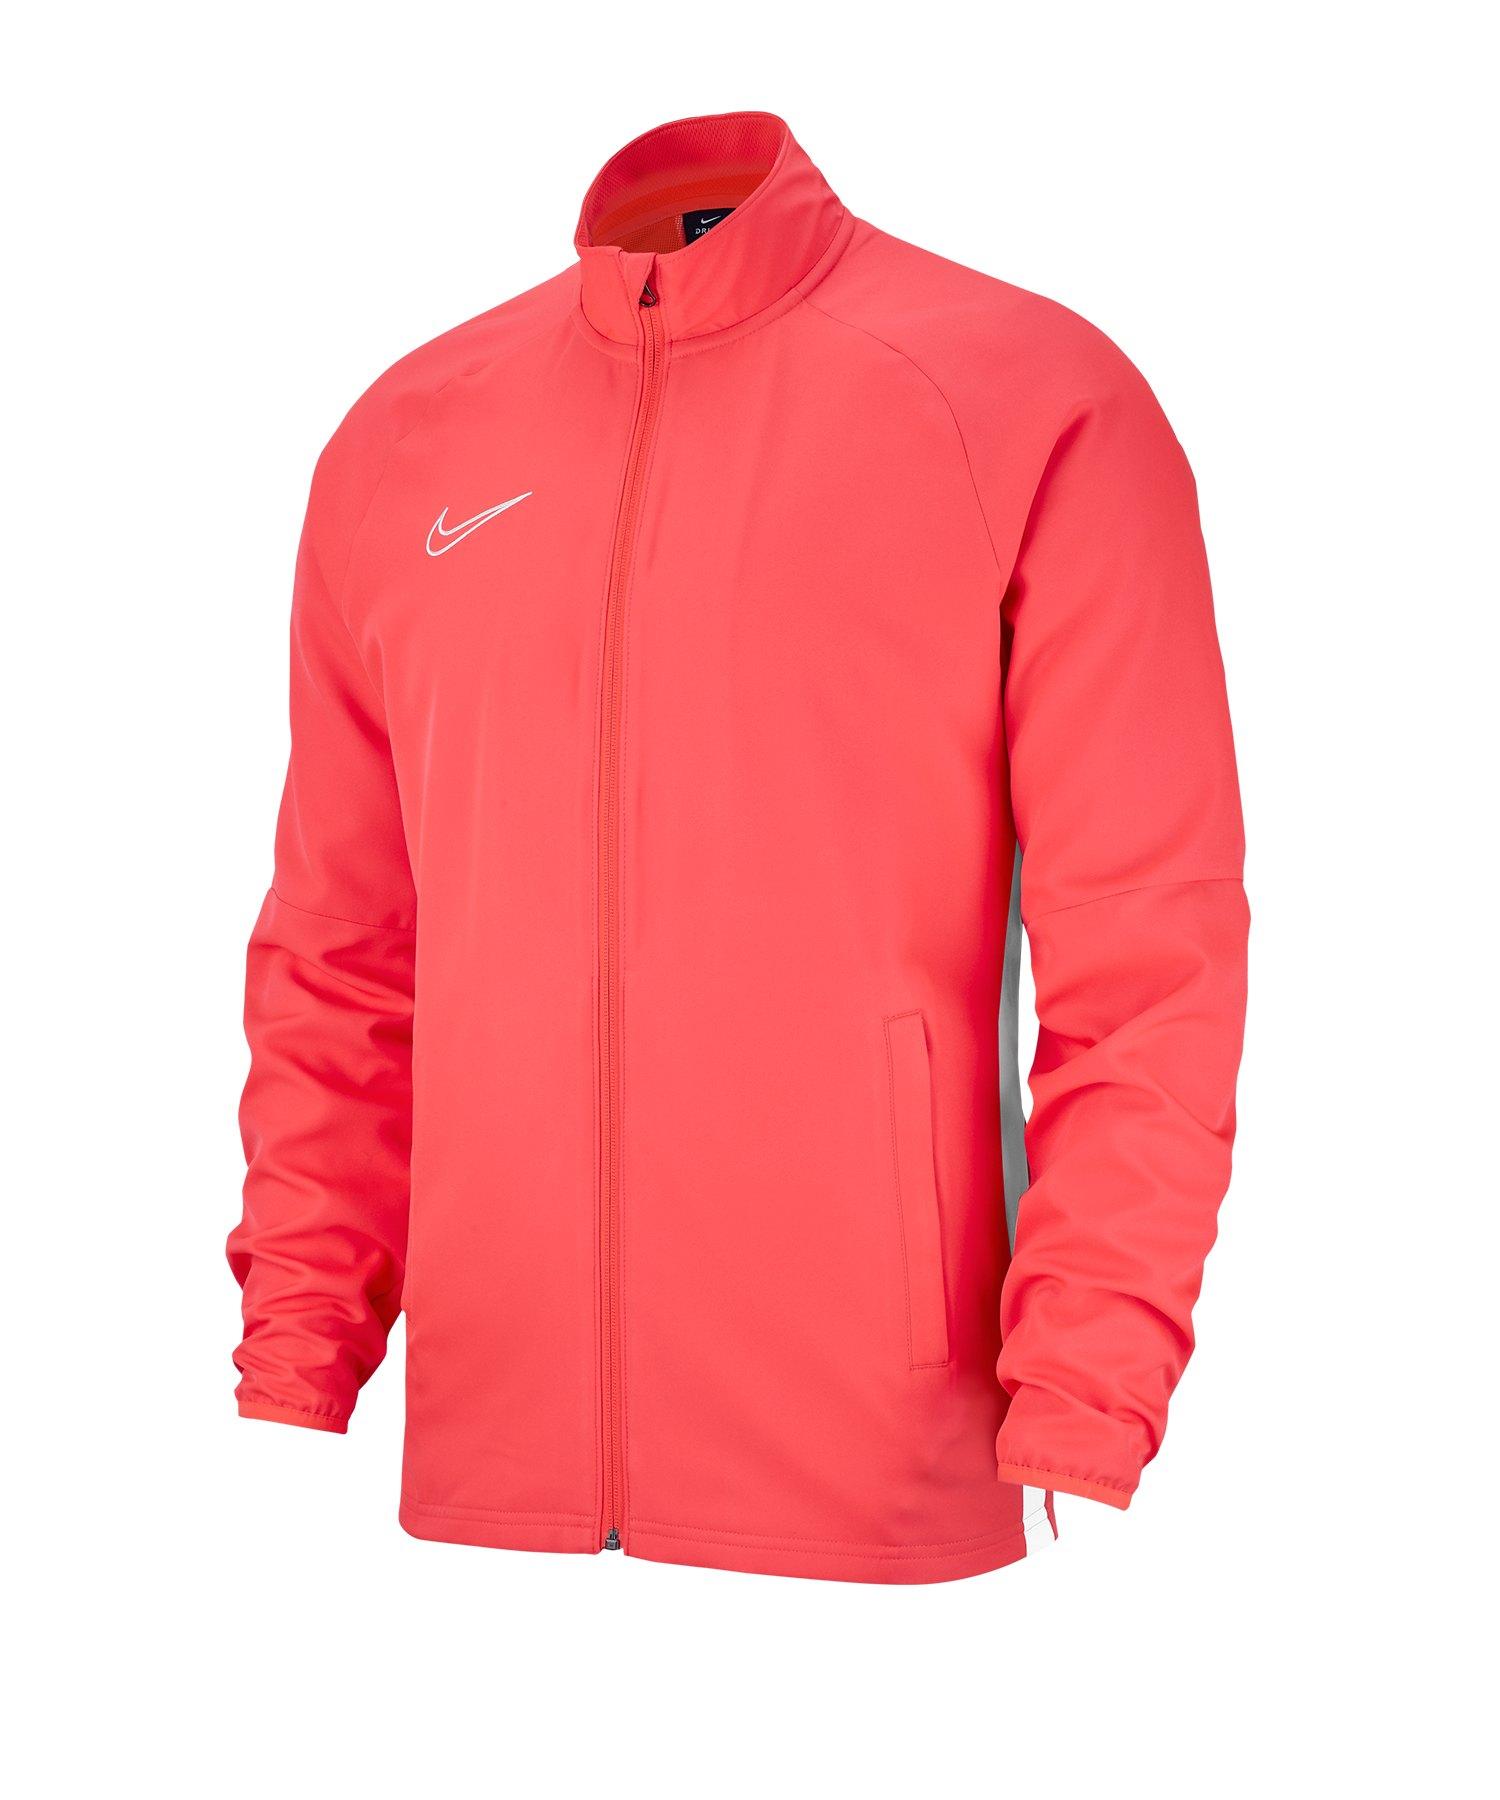 Nike Academy 19 Woven Präsentationsjacke Rot F671